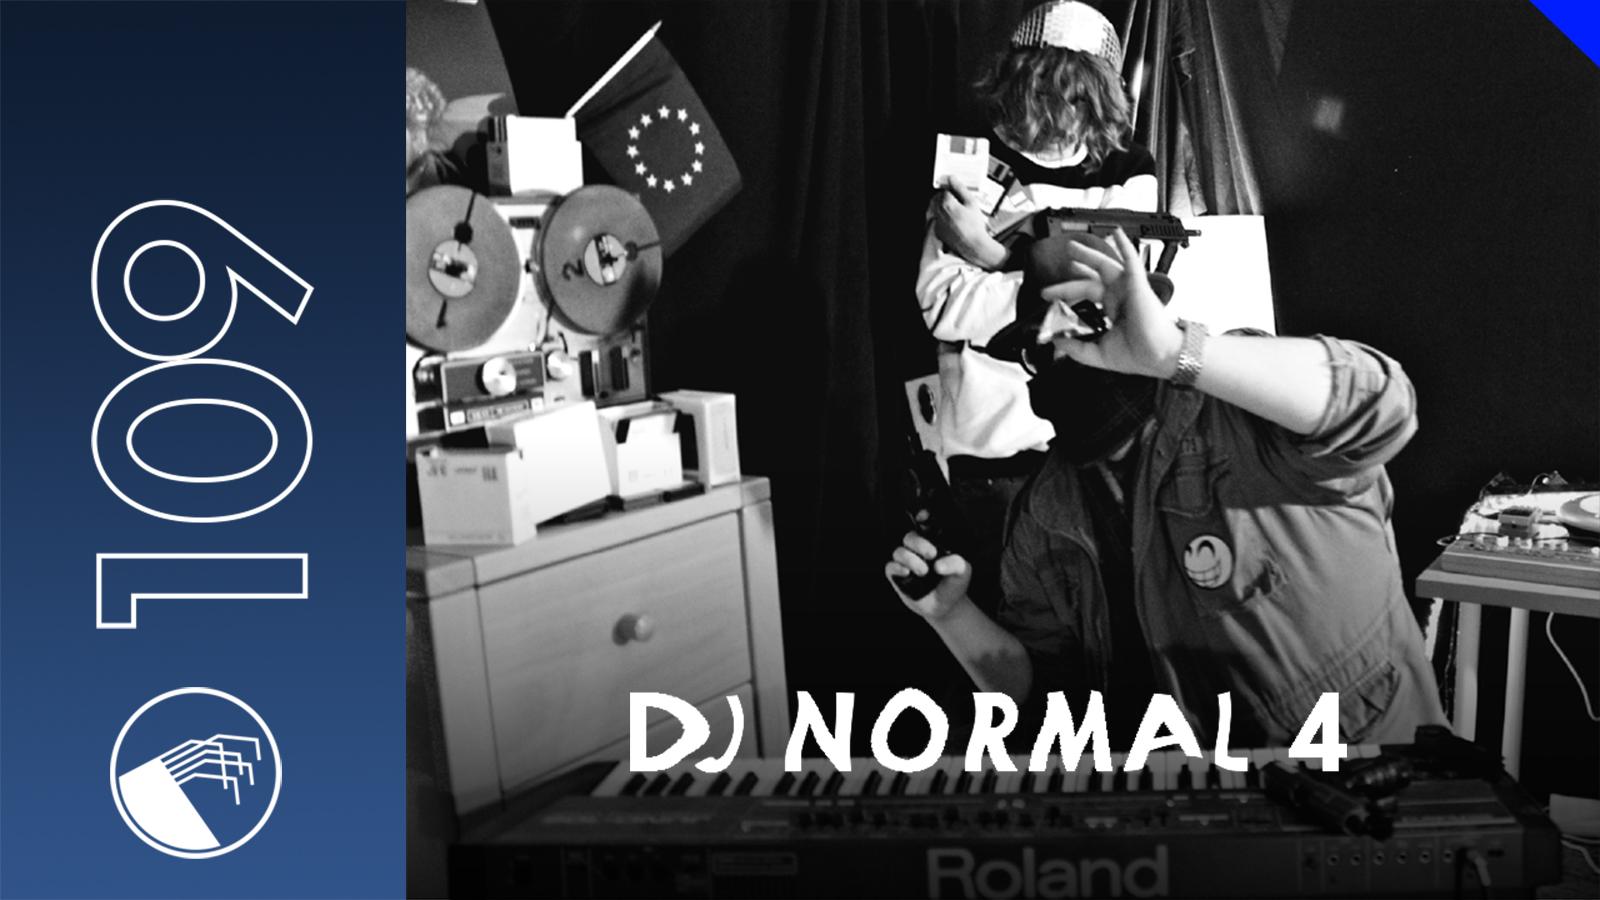 109 Dj Normal 4